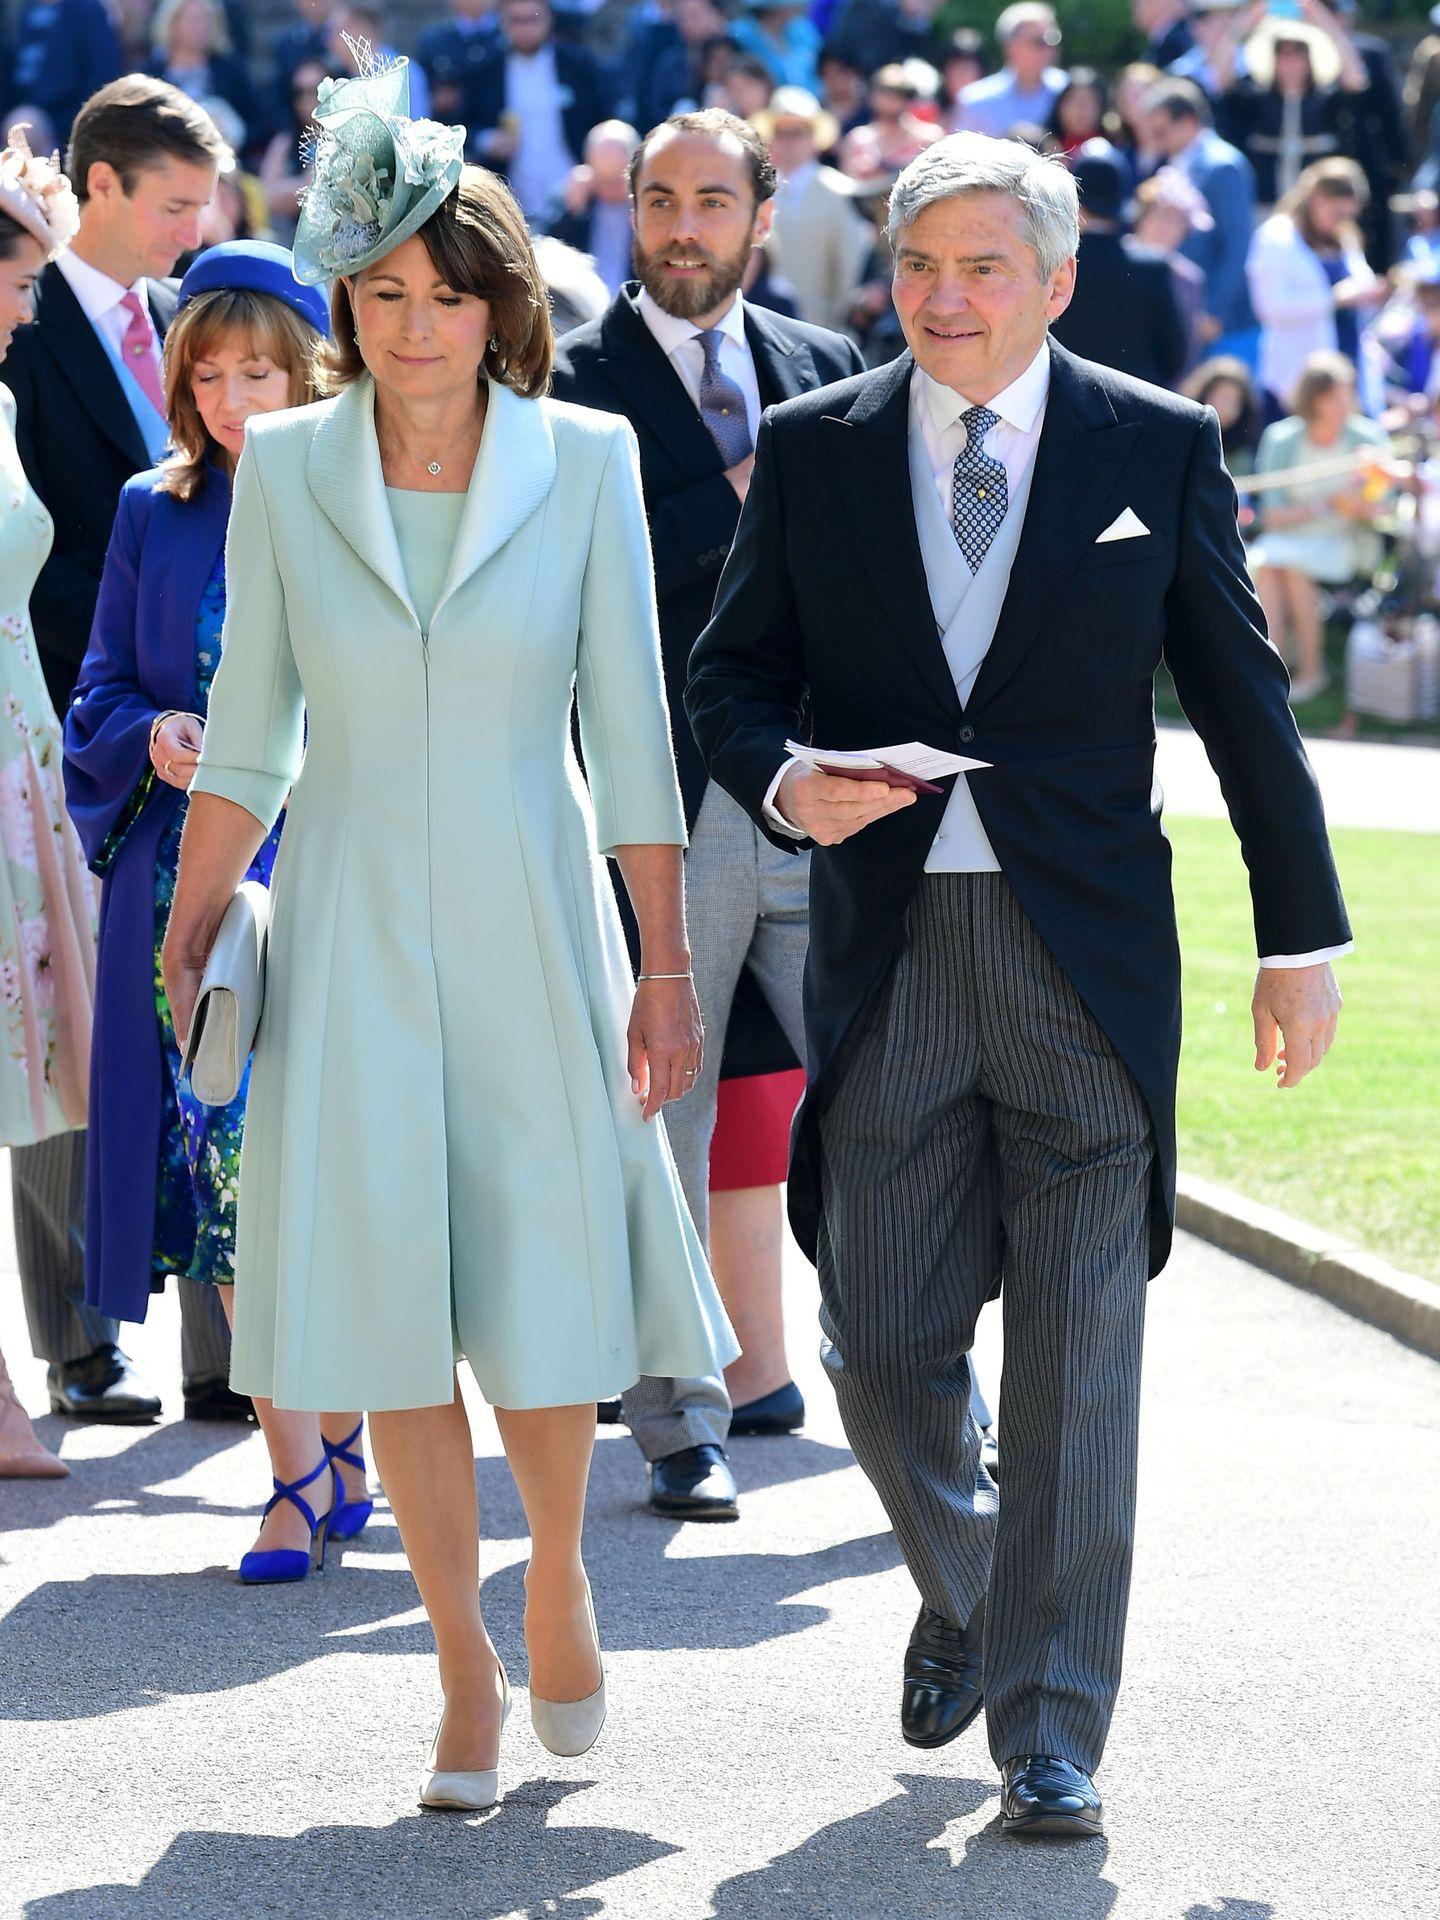 Carole y Michael Middleton en la boda de los duques de Sussex. (Reuters)